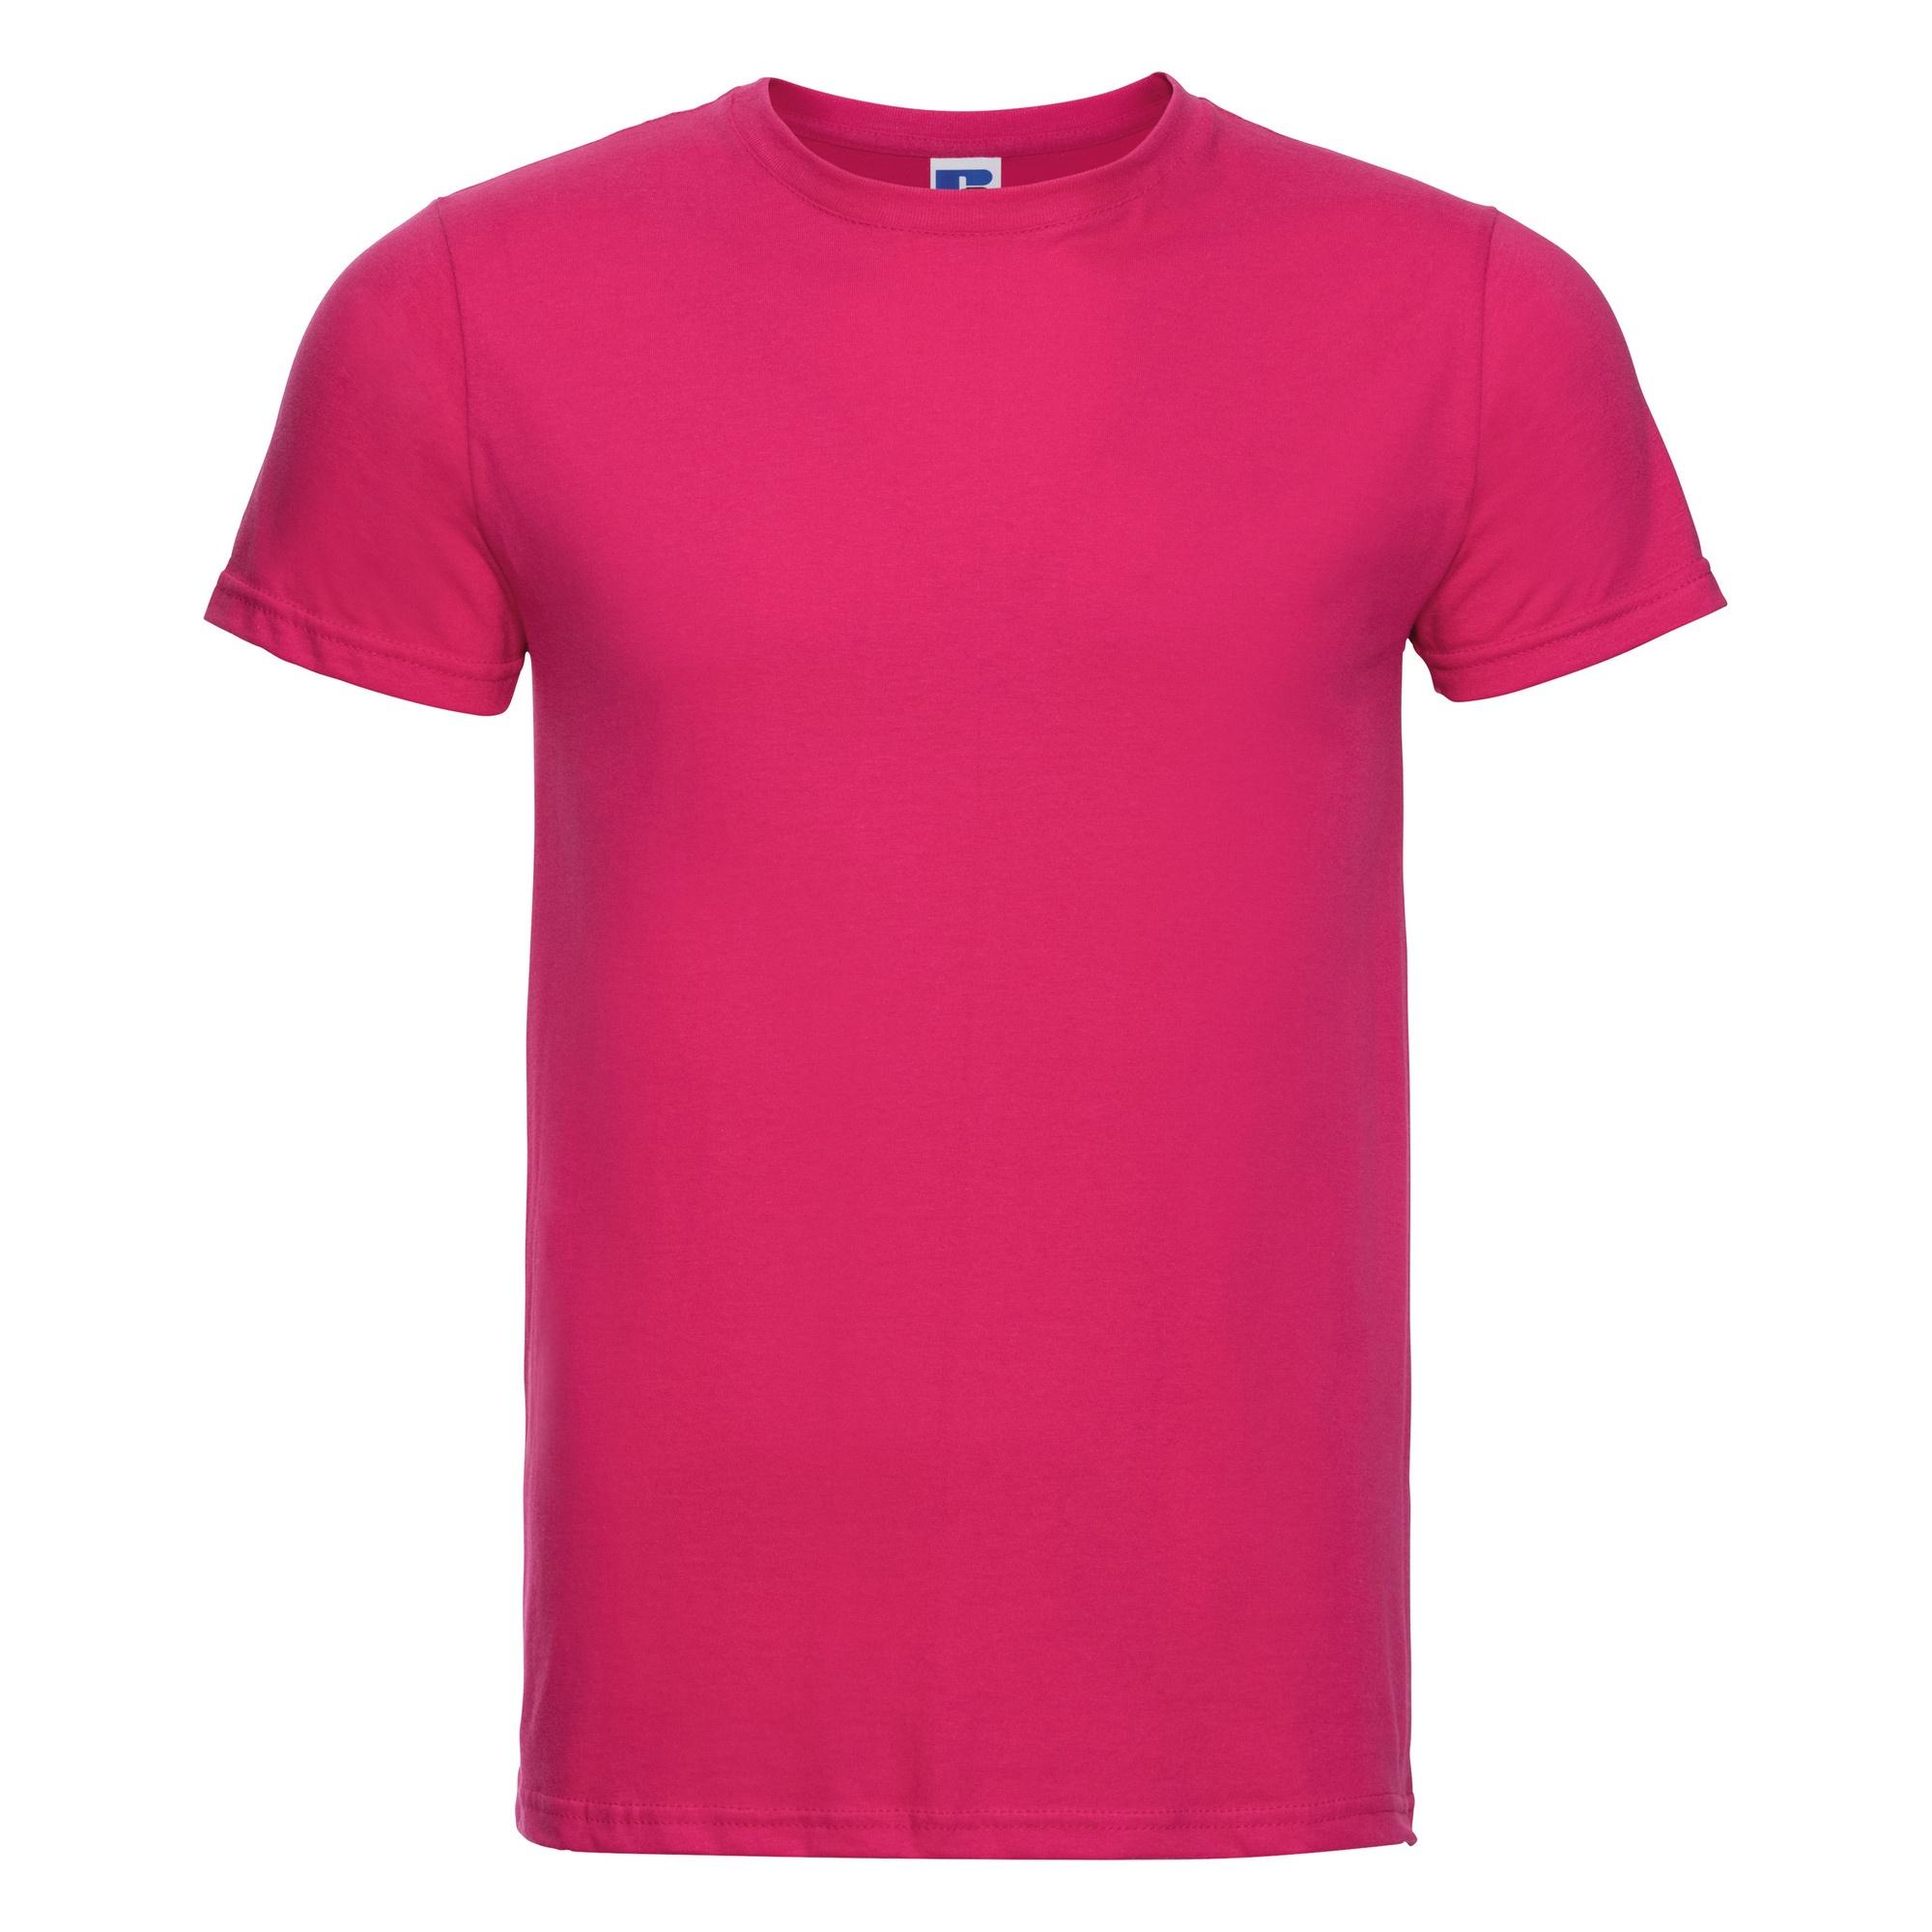 Russell-Mens-Slim-Plain-Blank-100-Cotton-Short-Sleeve-T-Shirt-Tee-BC1515 thumbnail 26